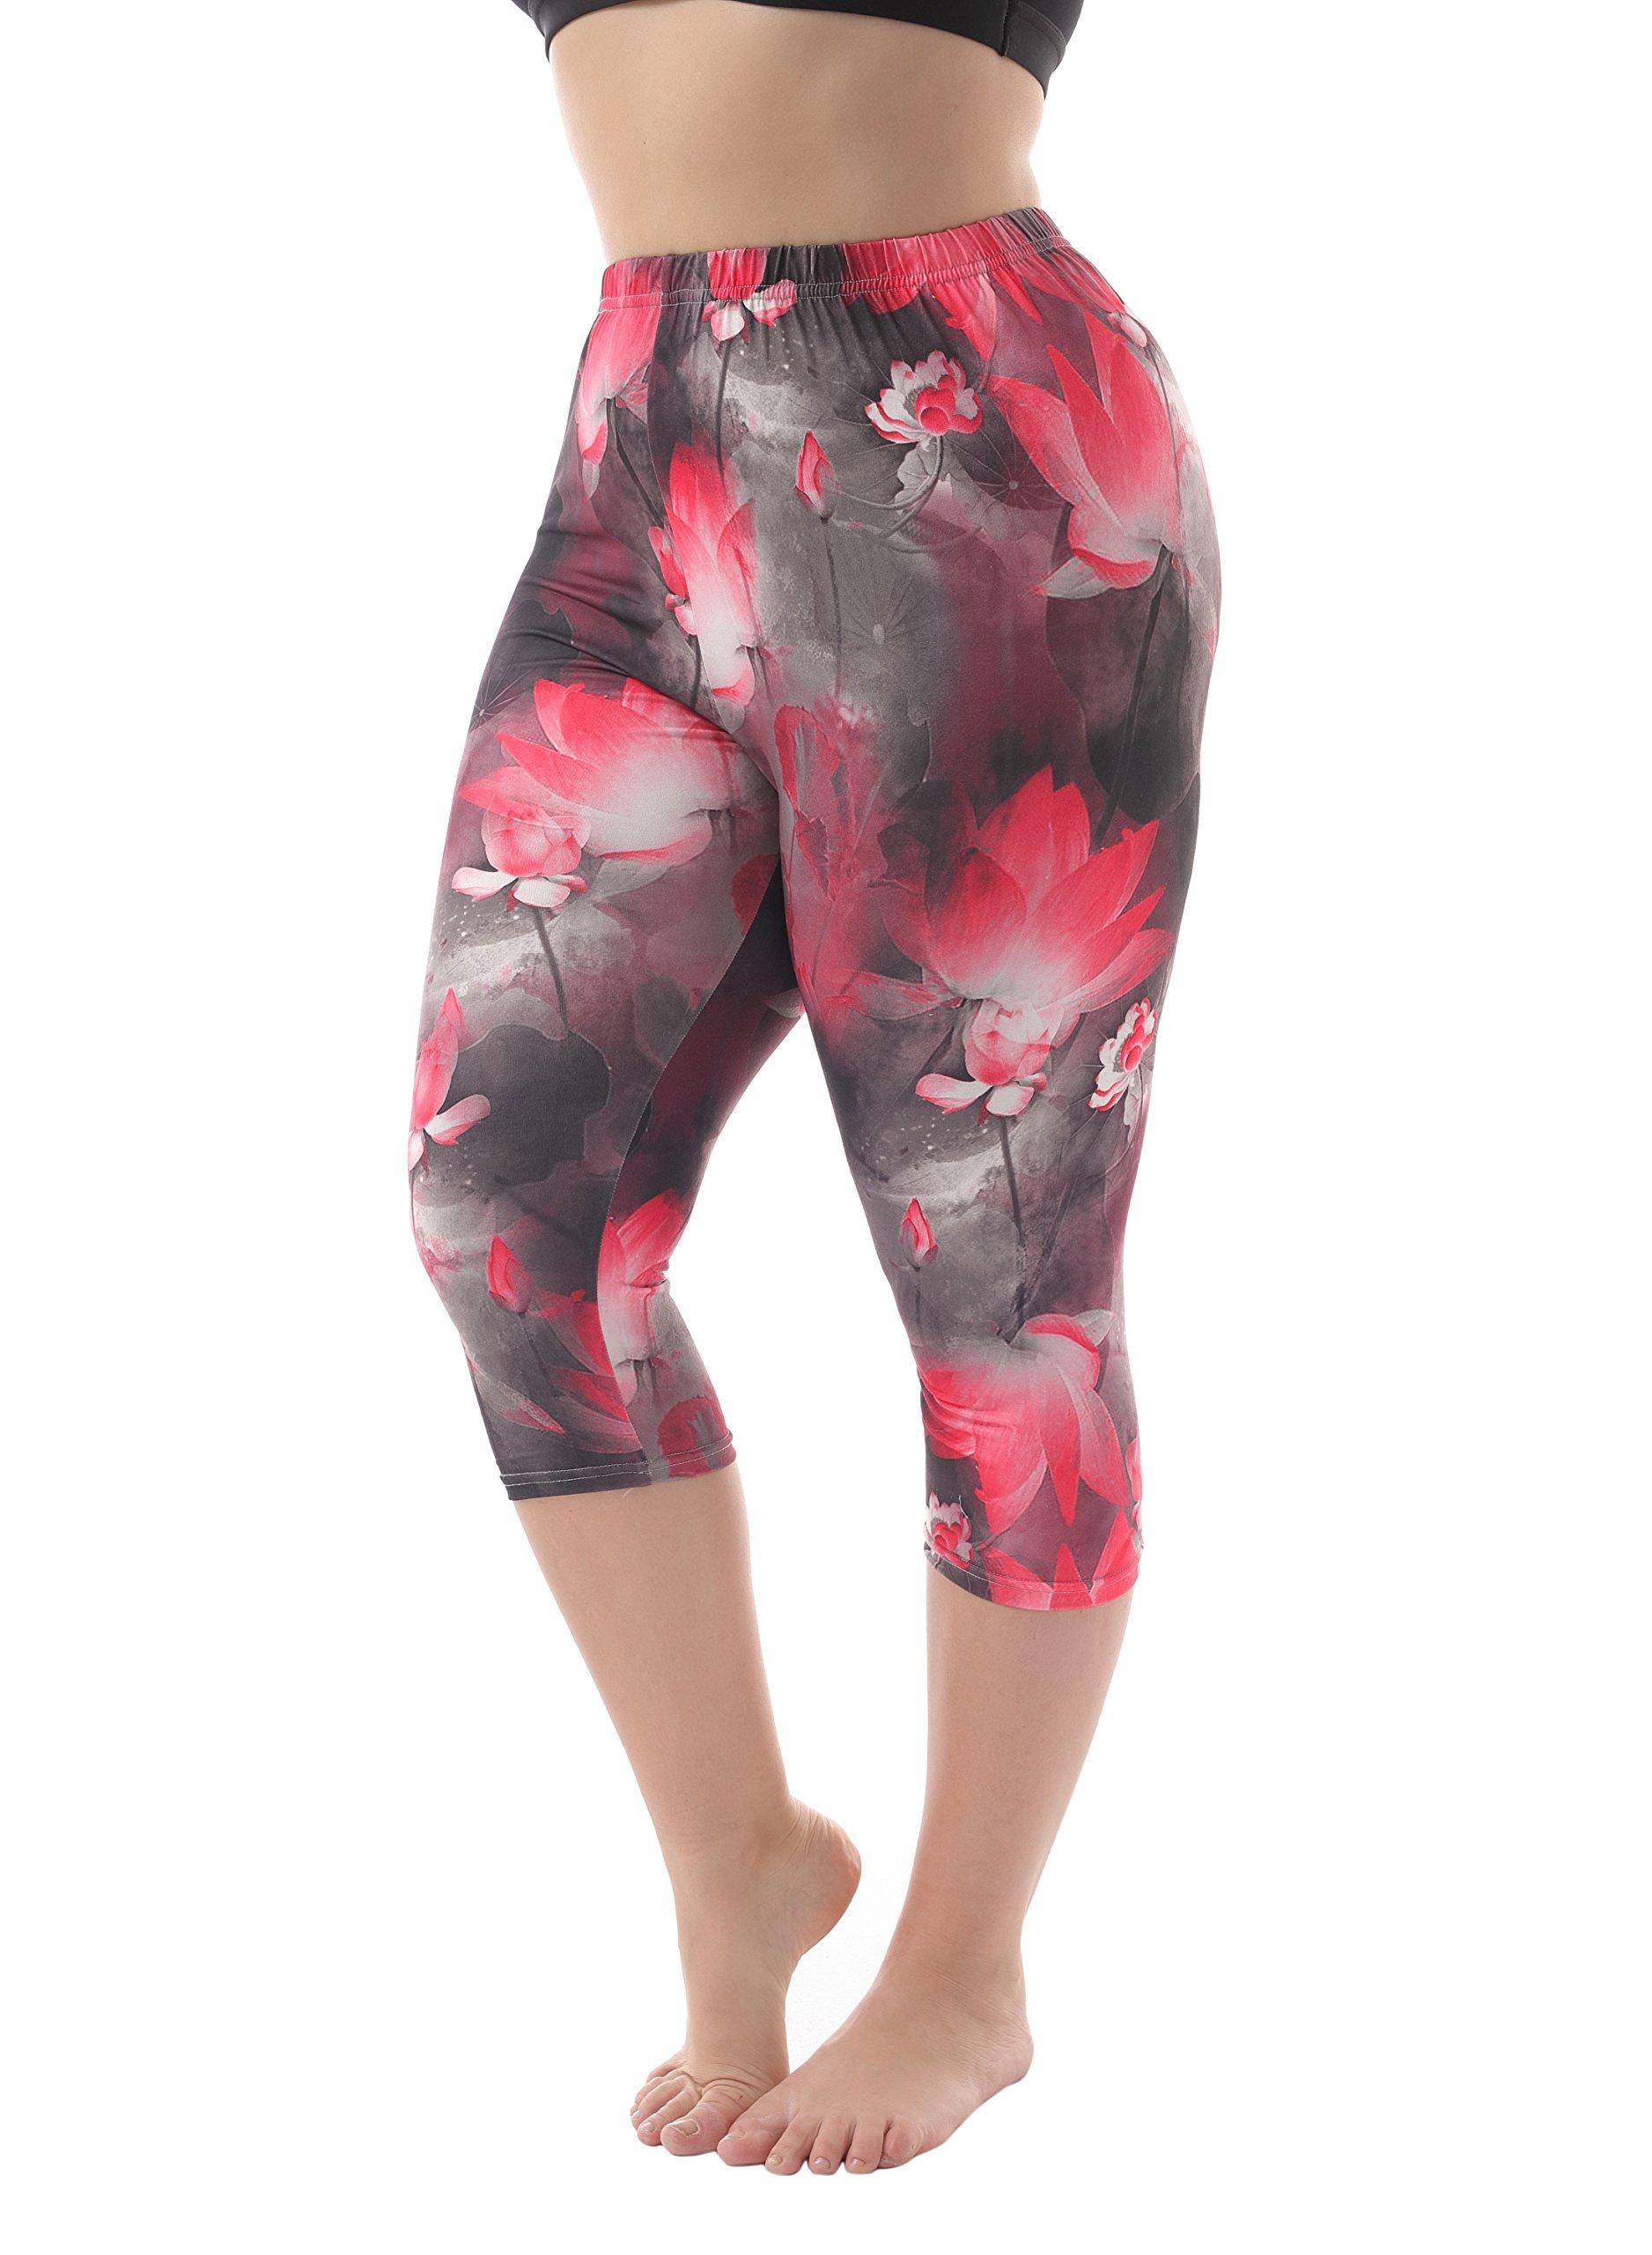 ZERDOCEAN Women's Plus Size Lightweight Printed Capri Leggings style-020 1X